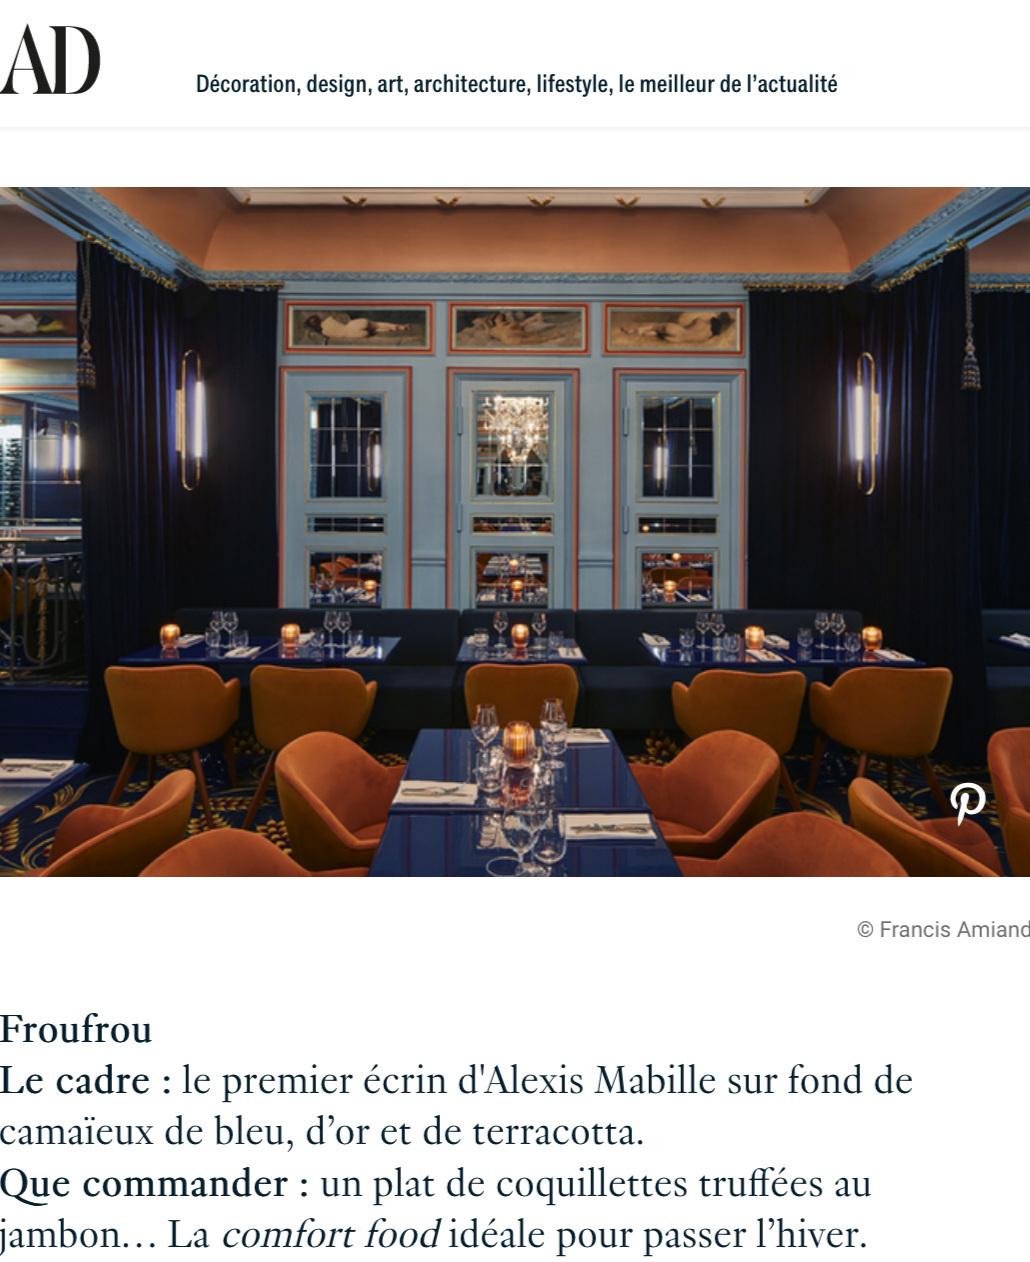 www.admagazine.fr_dec18.jpg